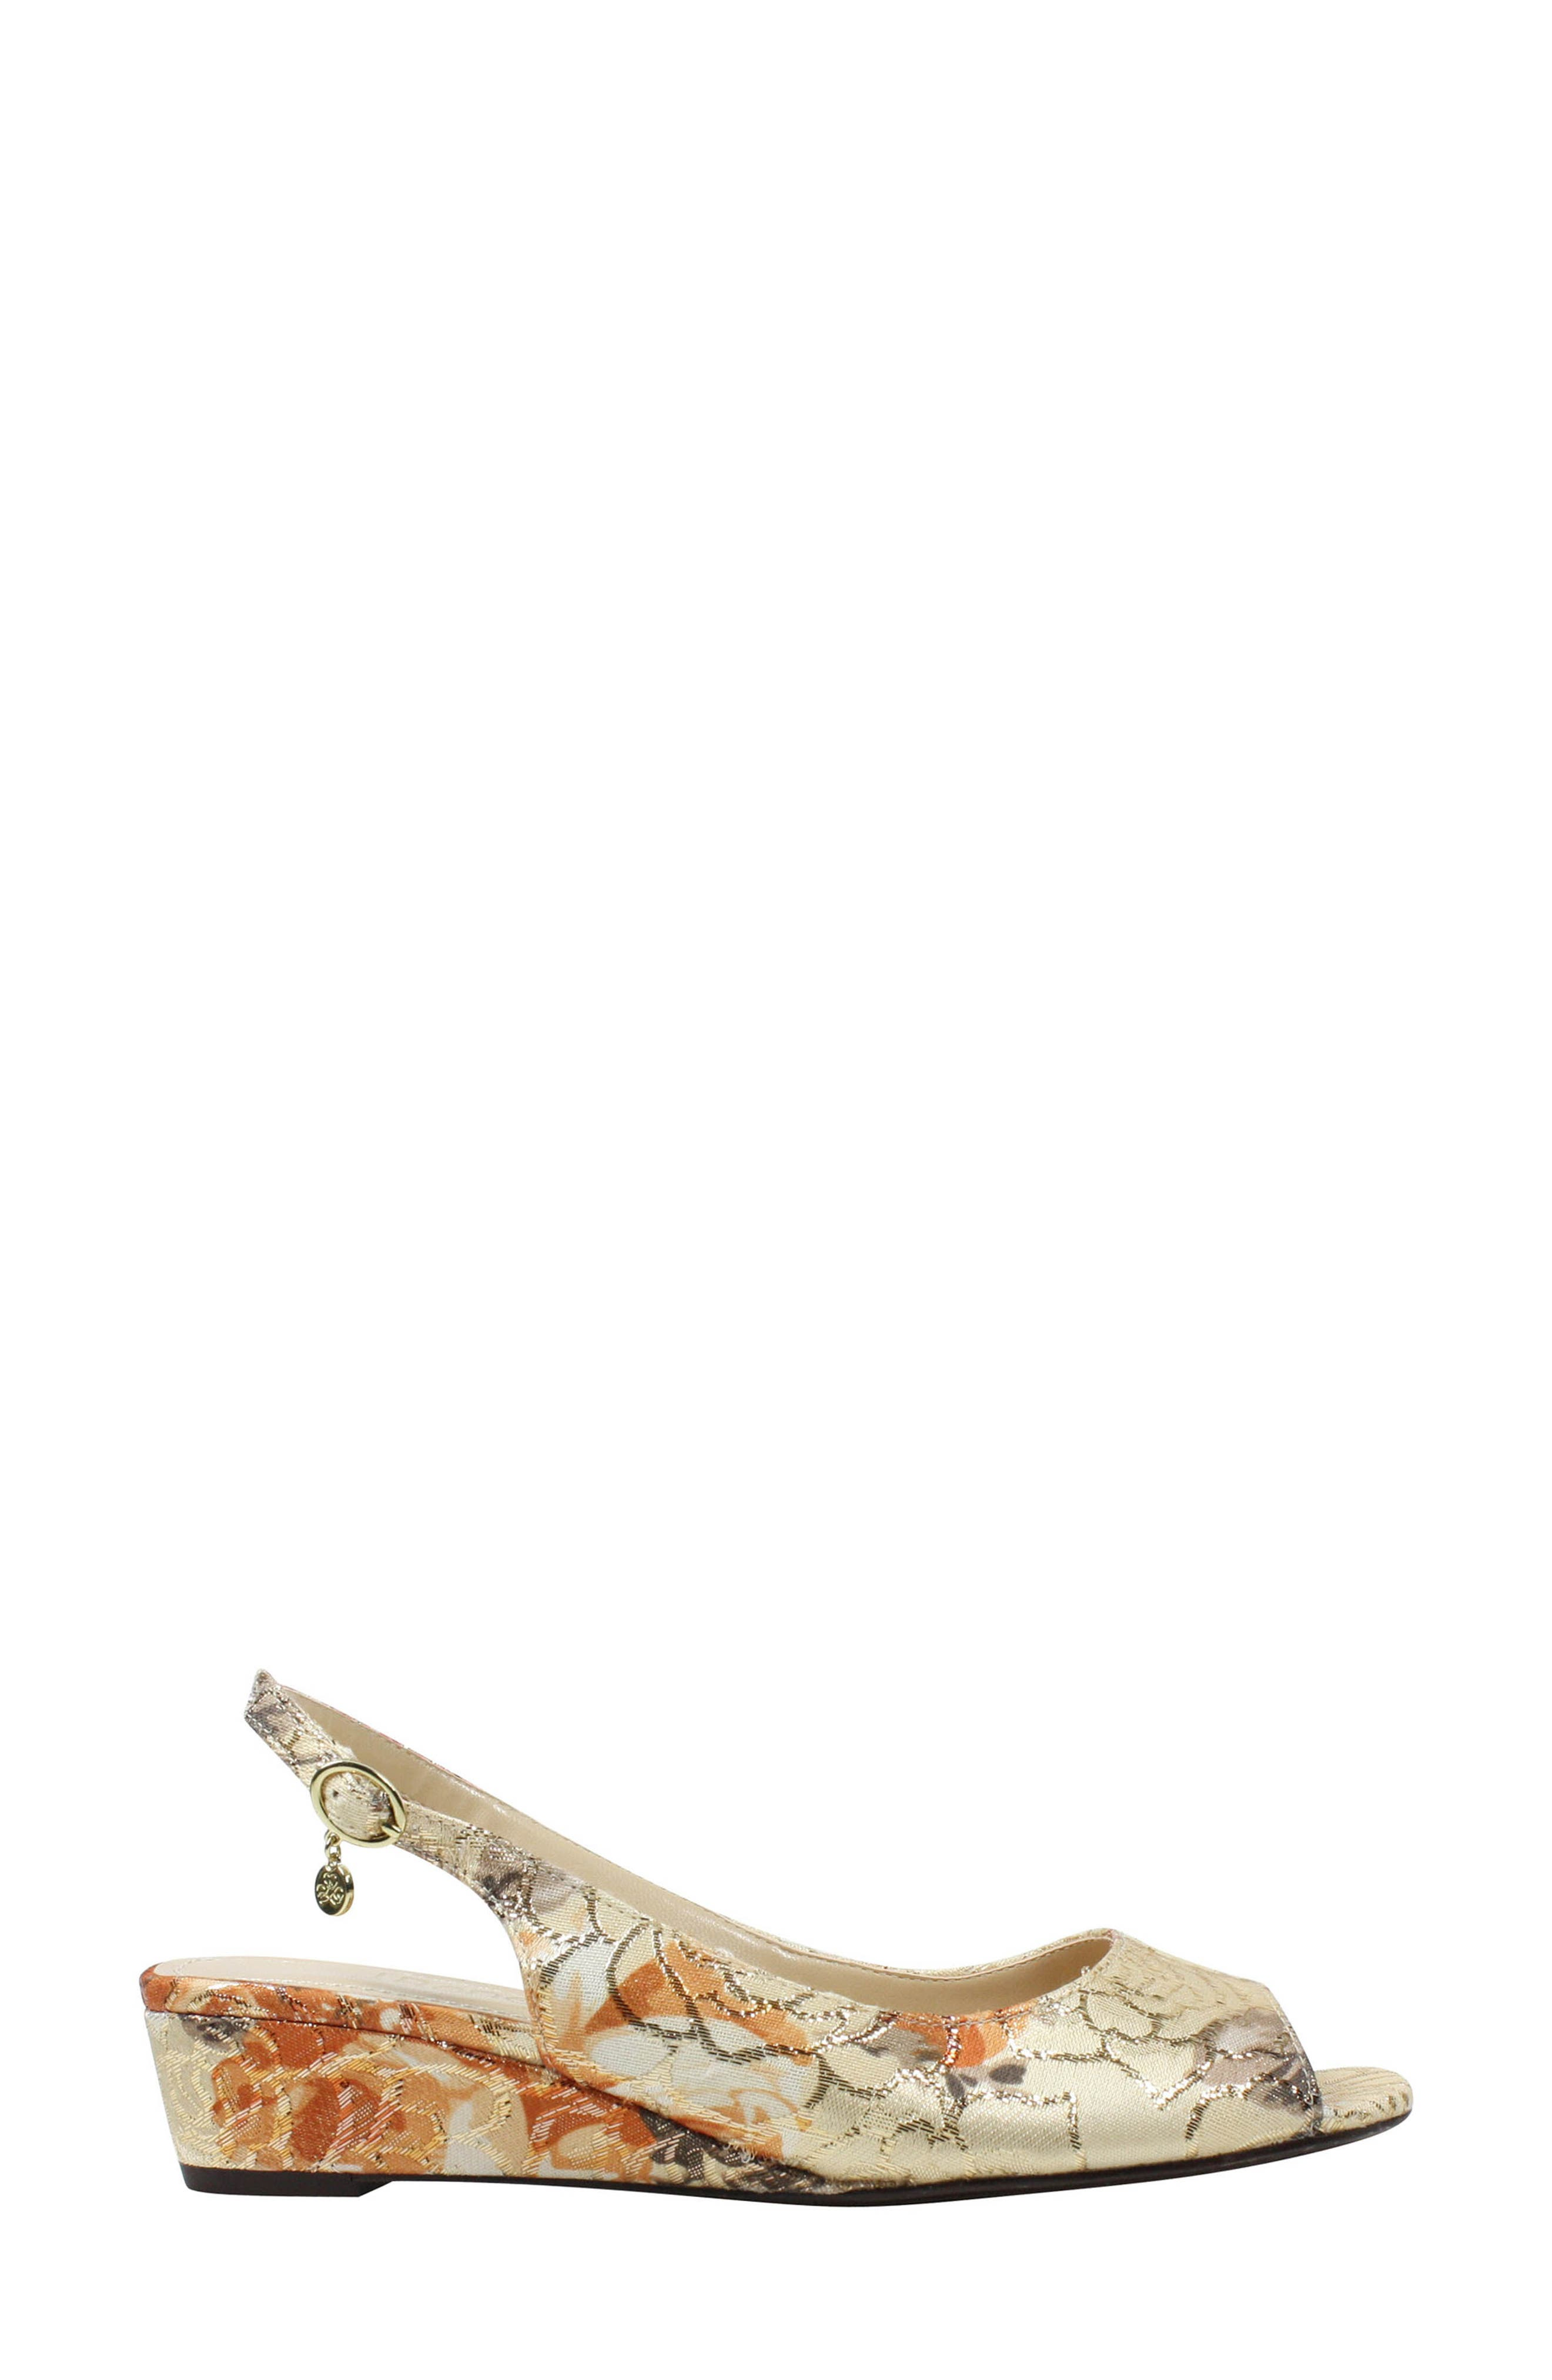 Alivia Slingback Sandal,                             Alternate thumbnail 3, color,                             Nude Multi/ Gold Fabric